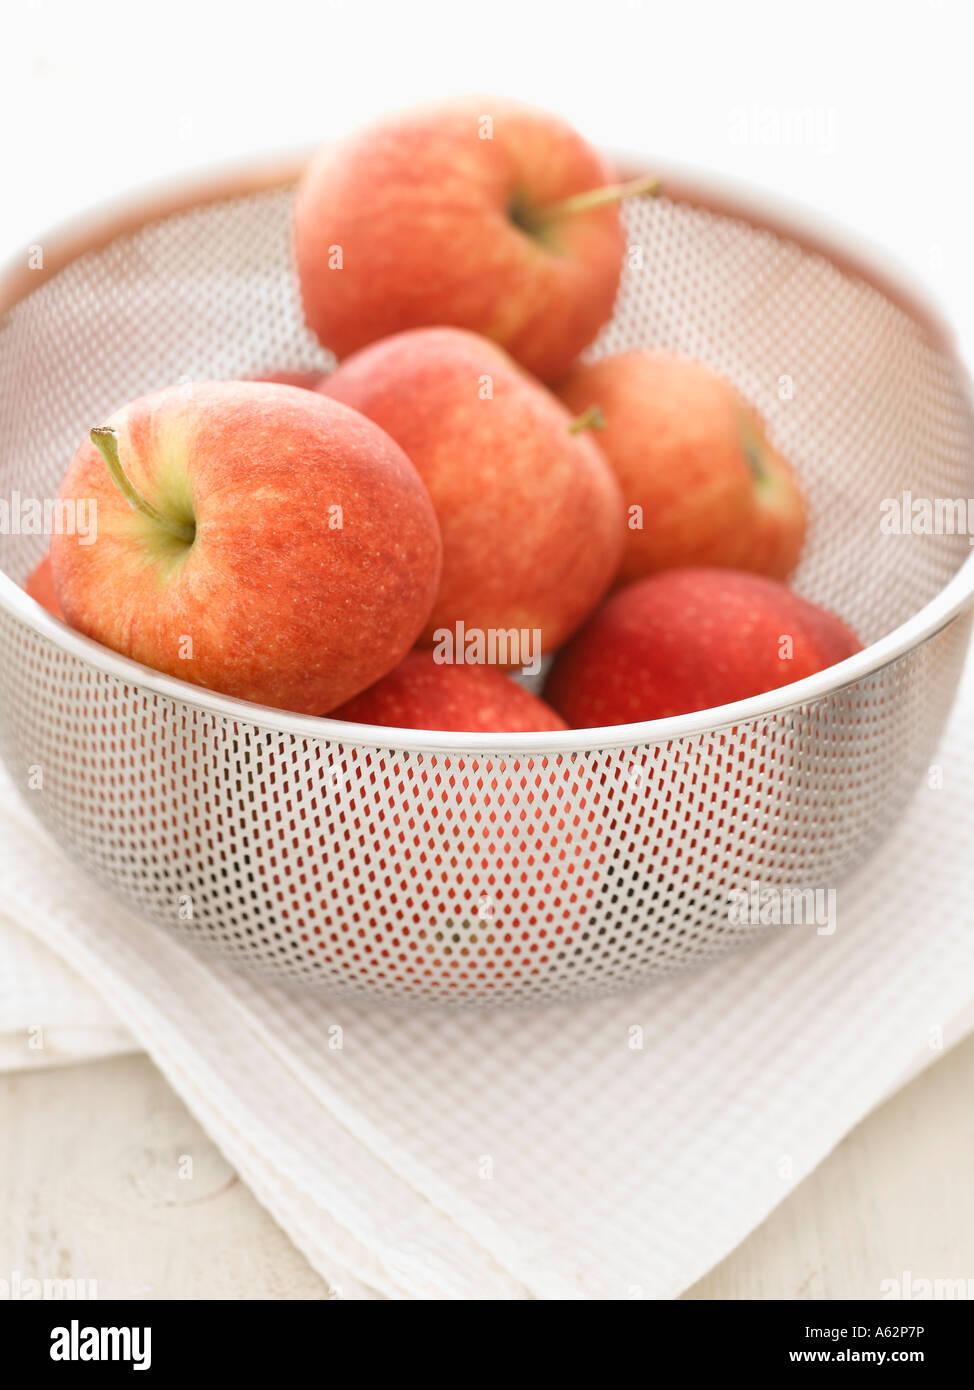 Still Life apples Photo Stock